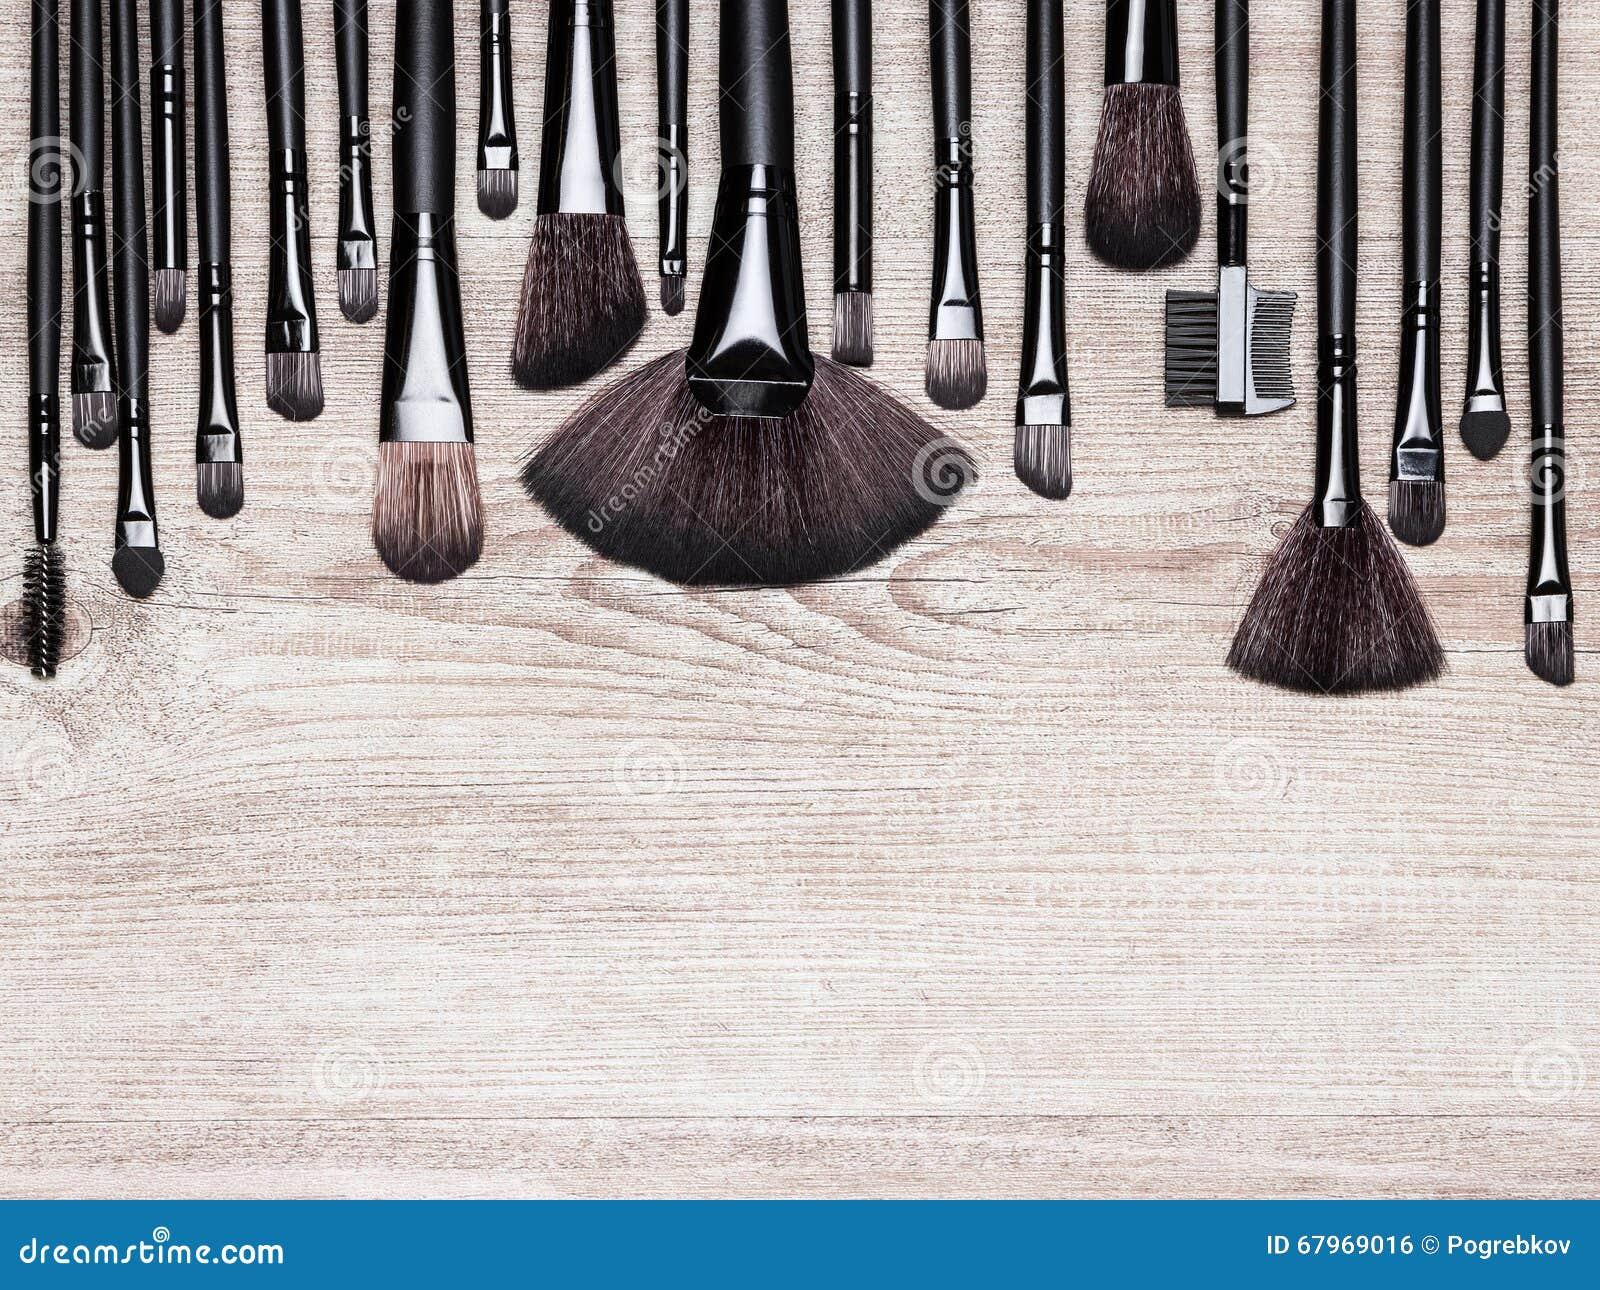 Various Makeup Brushes Royalty Free Stock Image